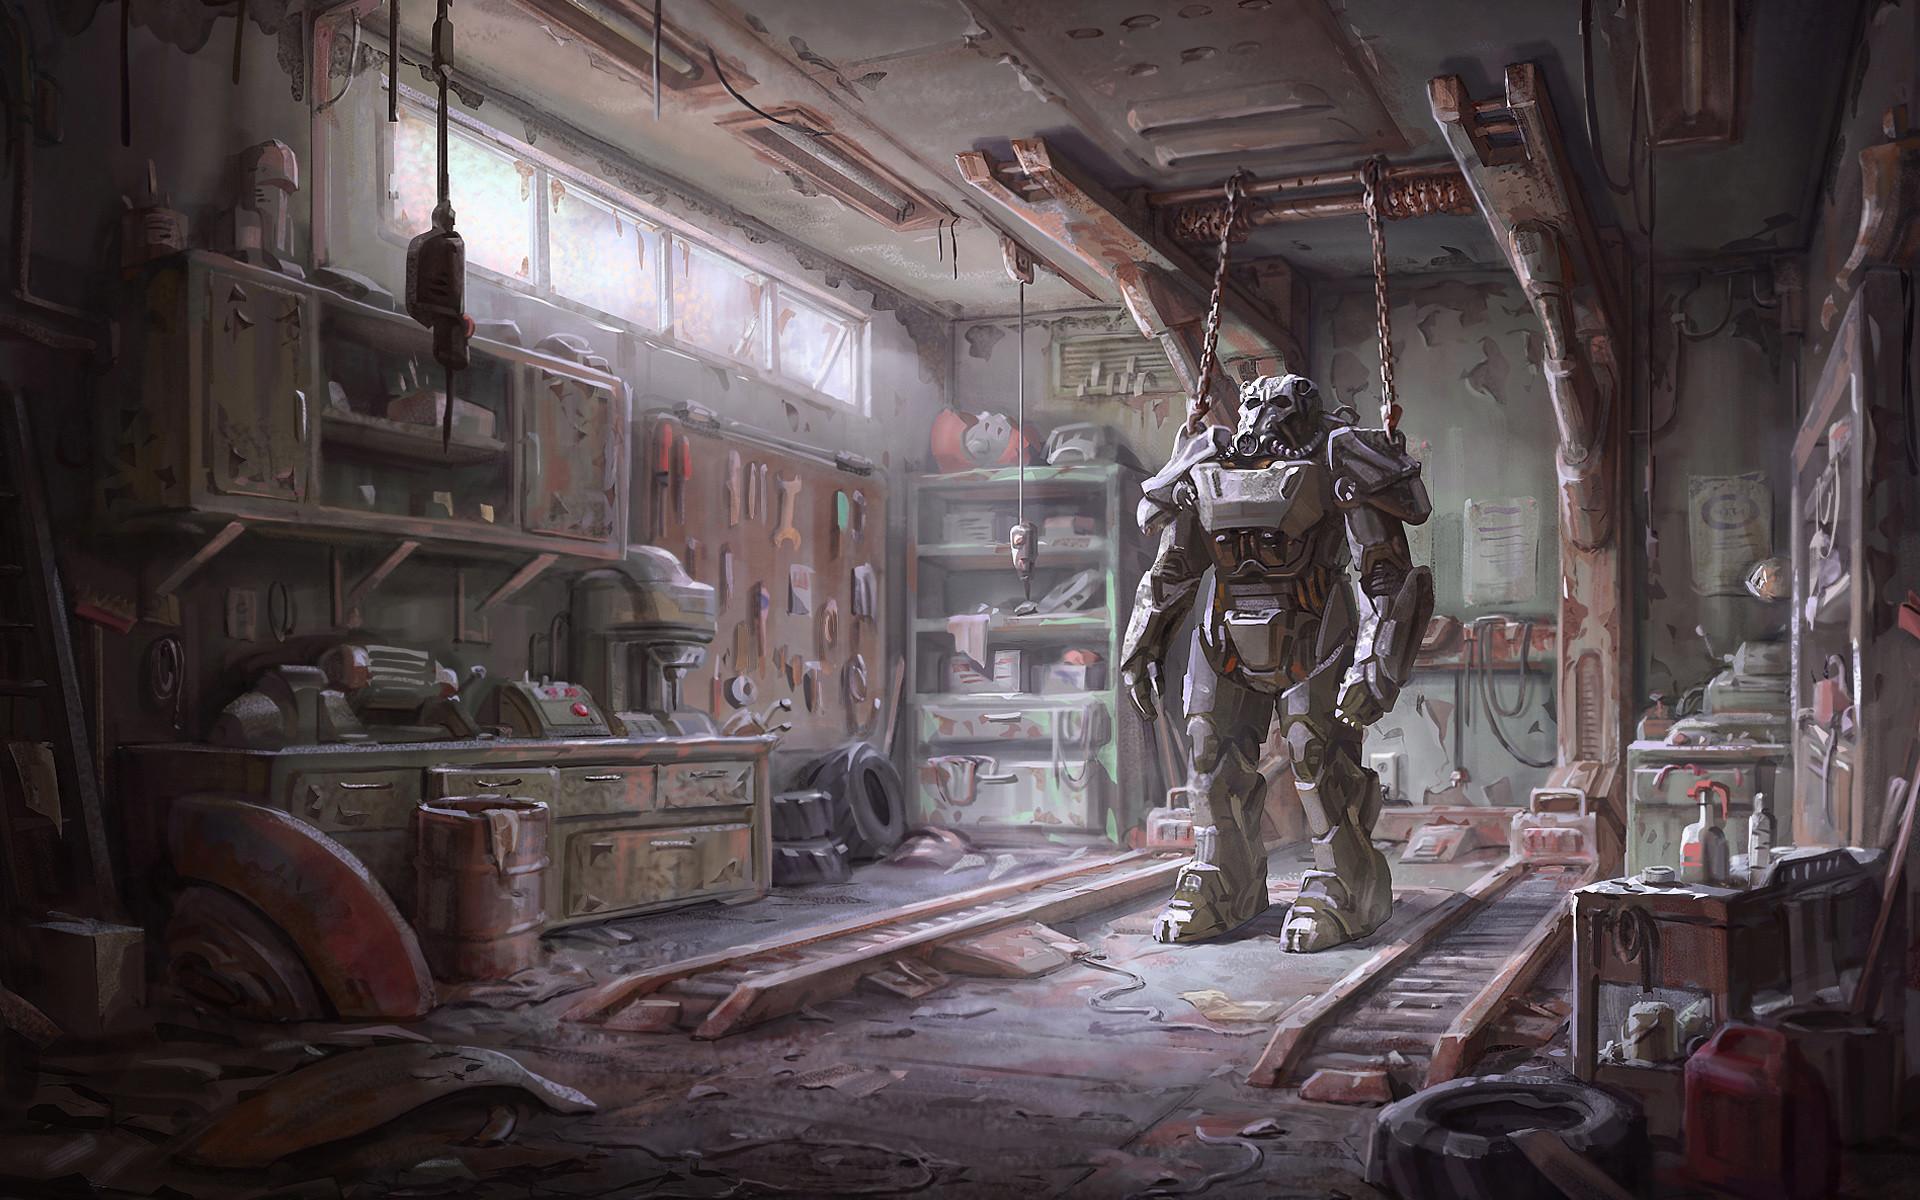 Fallout 4 Armour 4K Dual Screen Wallpaper – HD Wallpapers